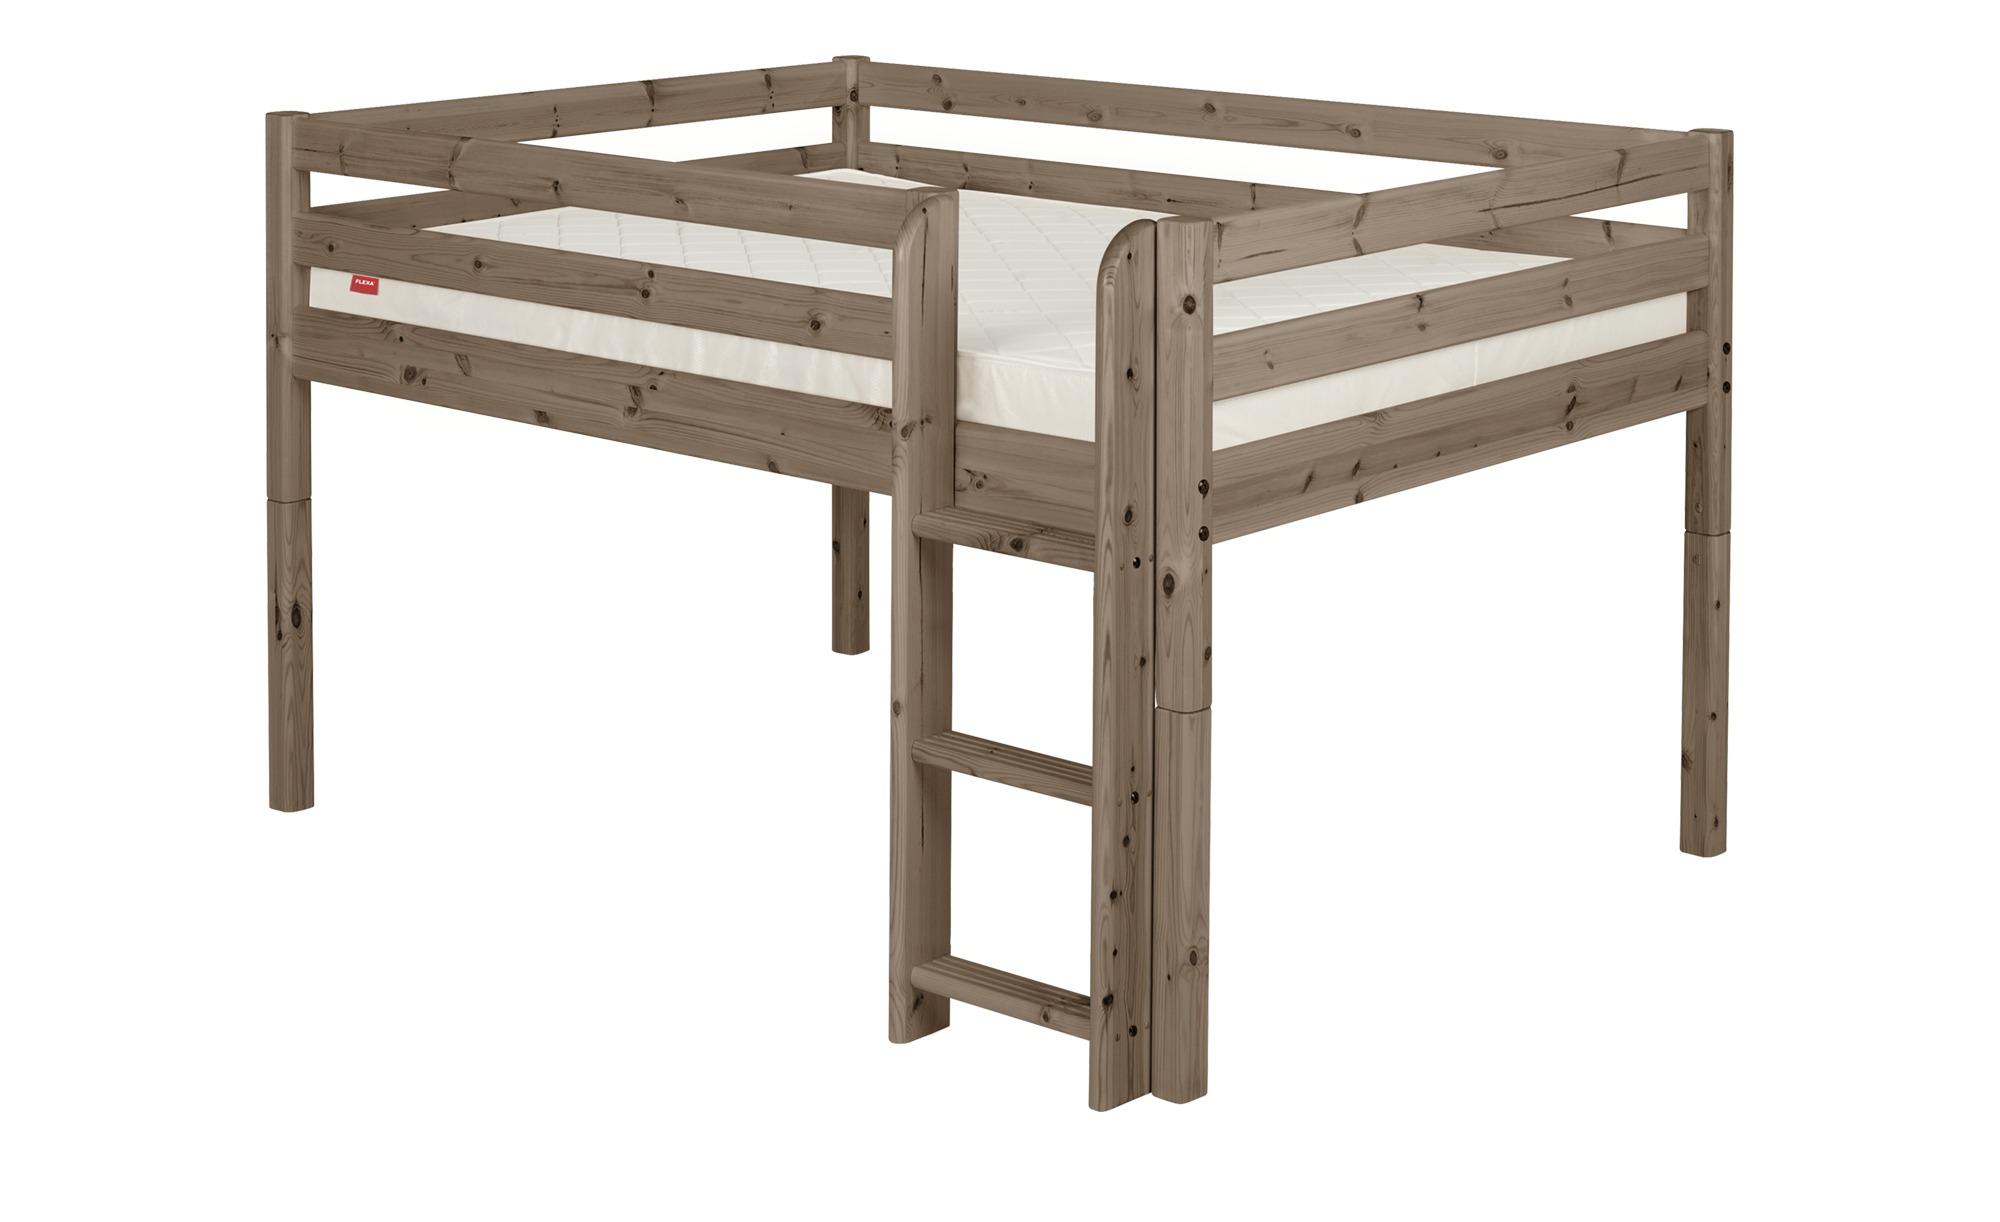 flexa halbhohes bett flexa classic breite 160 cm h he. Black Bedroom Furniture Sets. Home Design Ideas